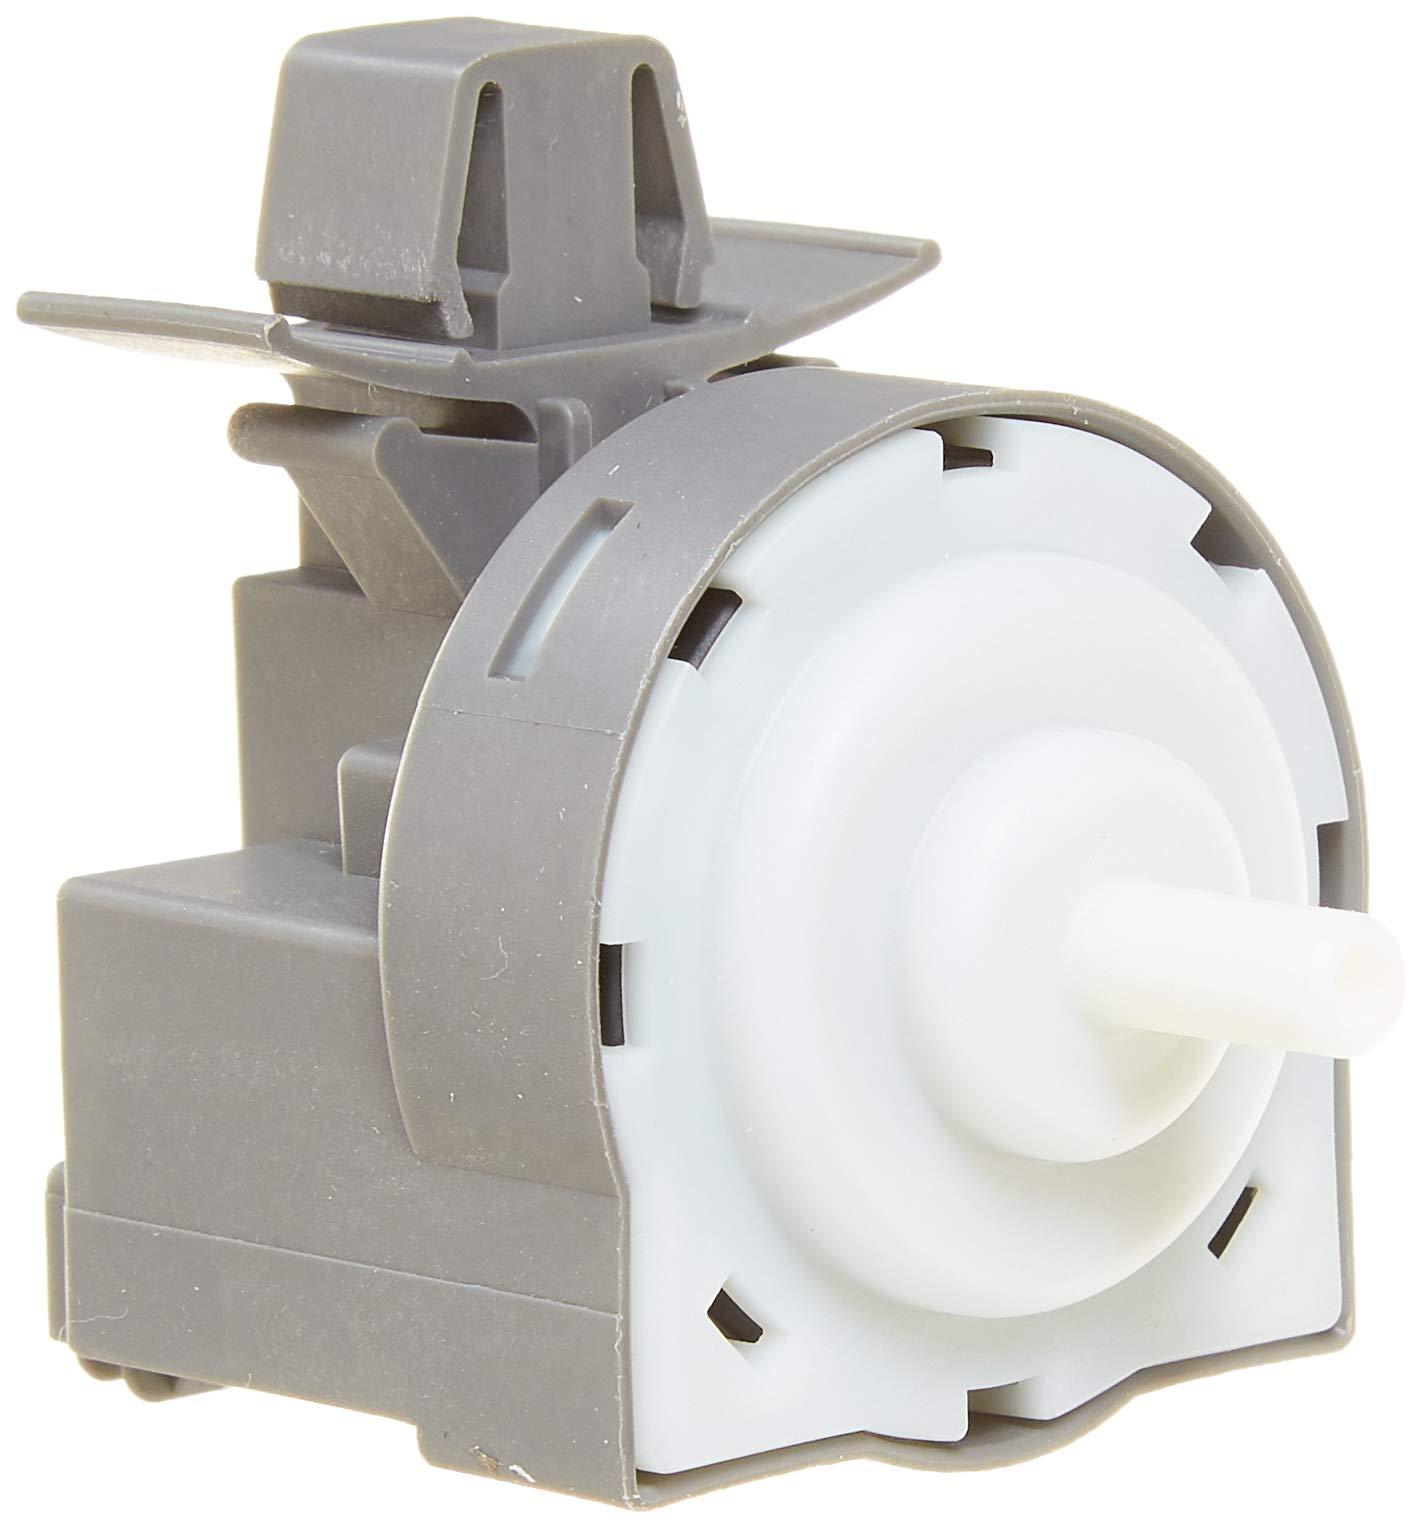 Frigidaire 5304504885 Laundry Center Washer Water-Level Sensor, Silver